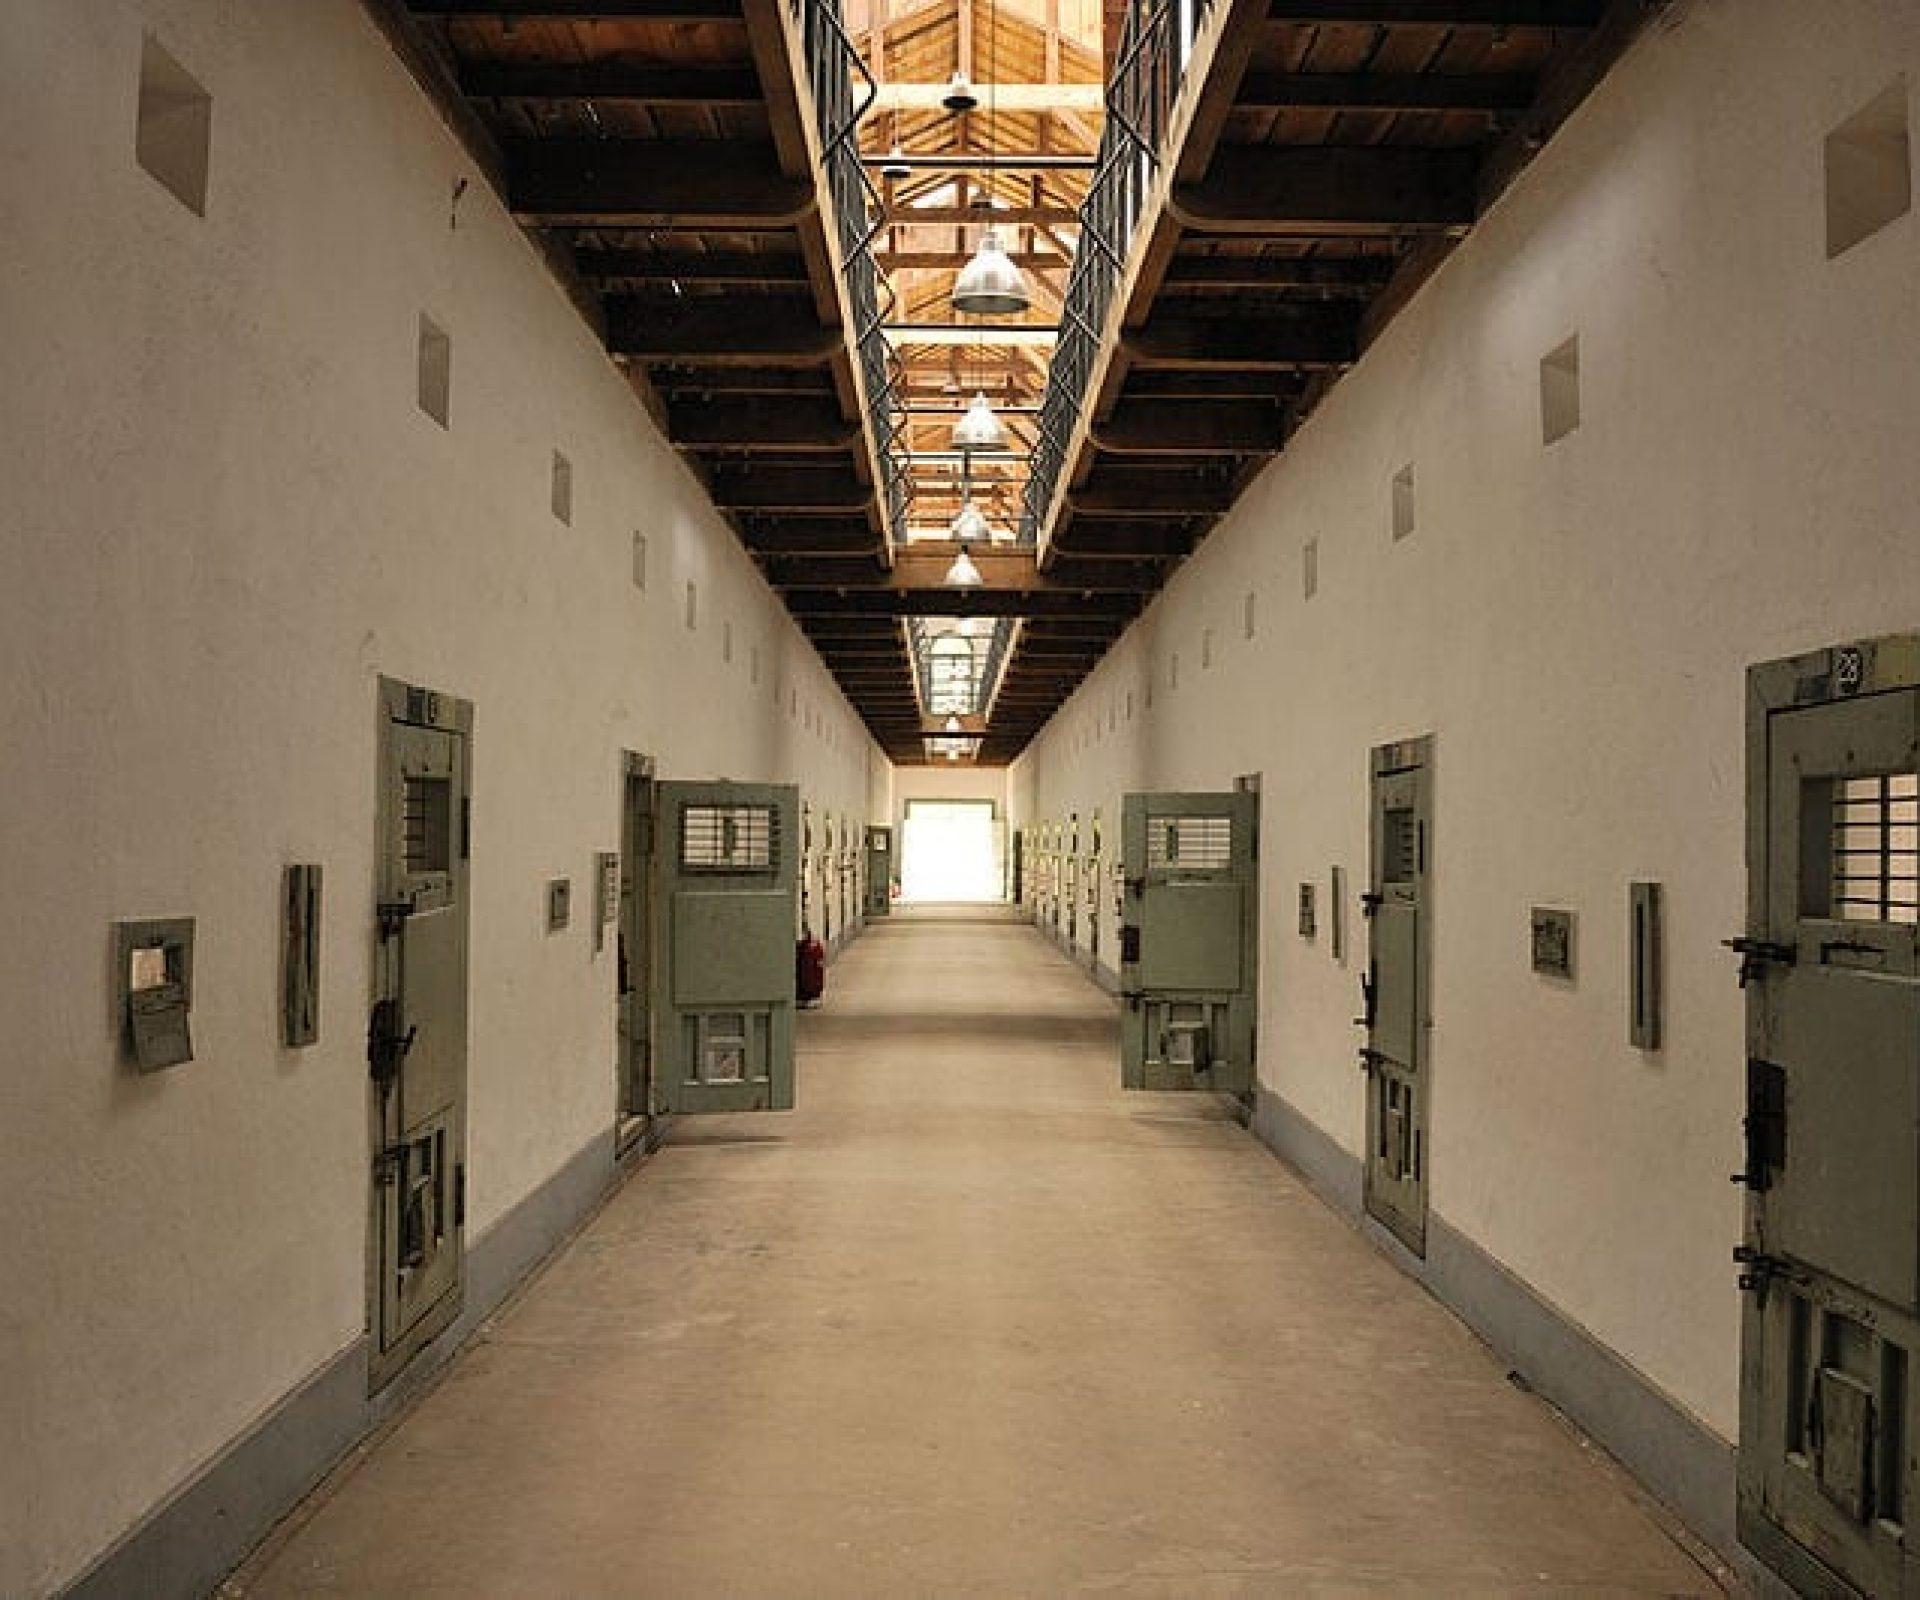 Seodaemun Prison History Museum | Seodaemun-gu, Seoul